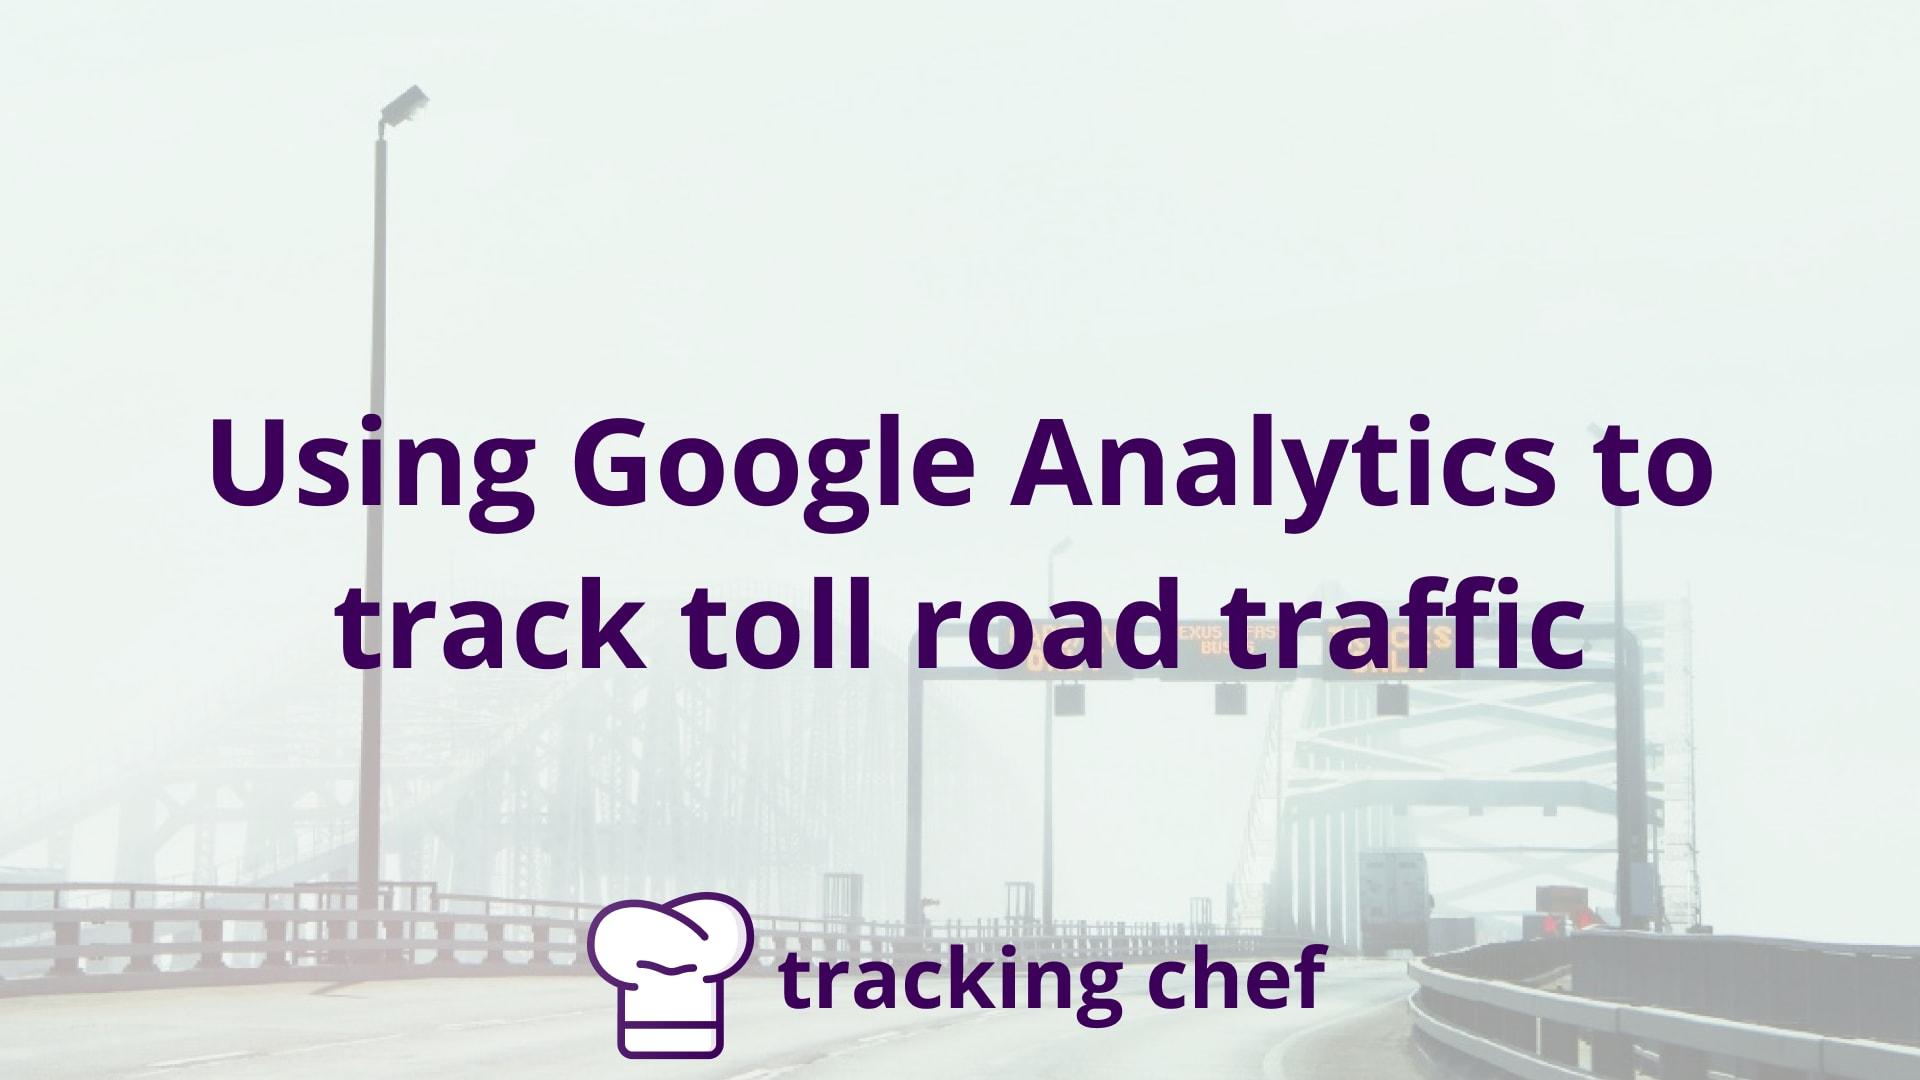 Using Google Analytics to track toll road traffic